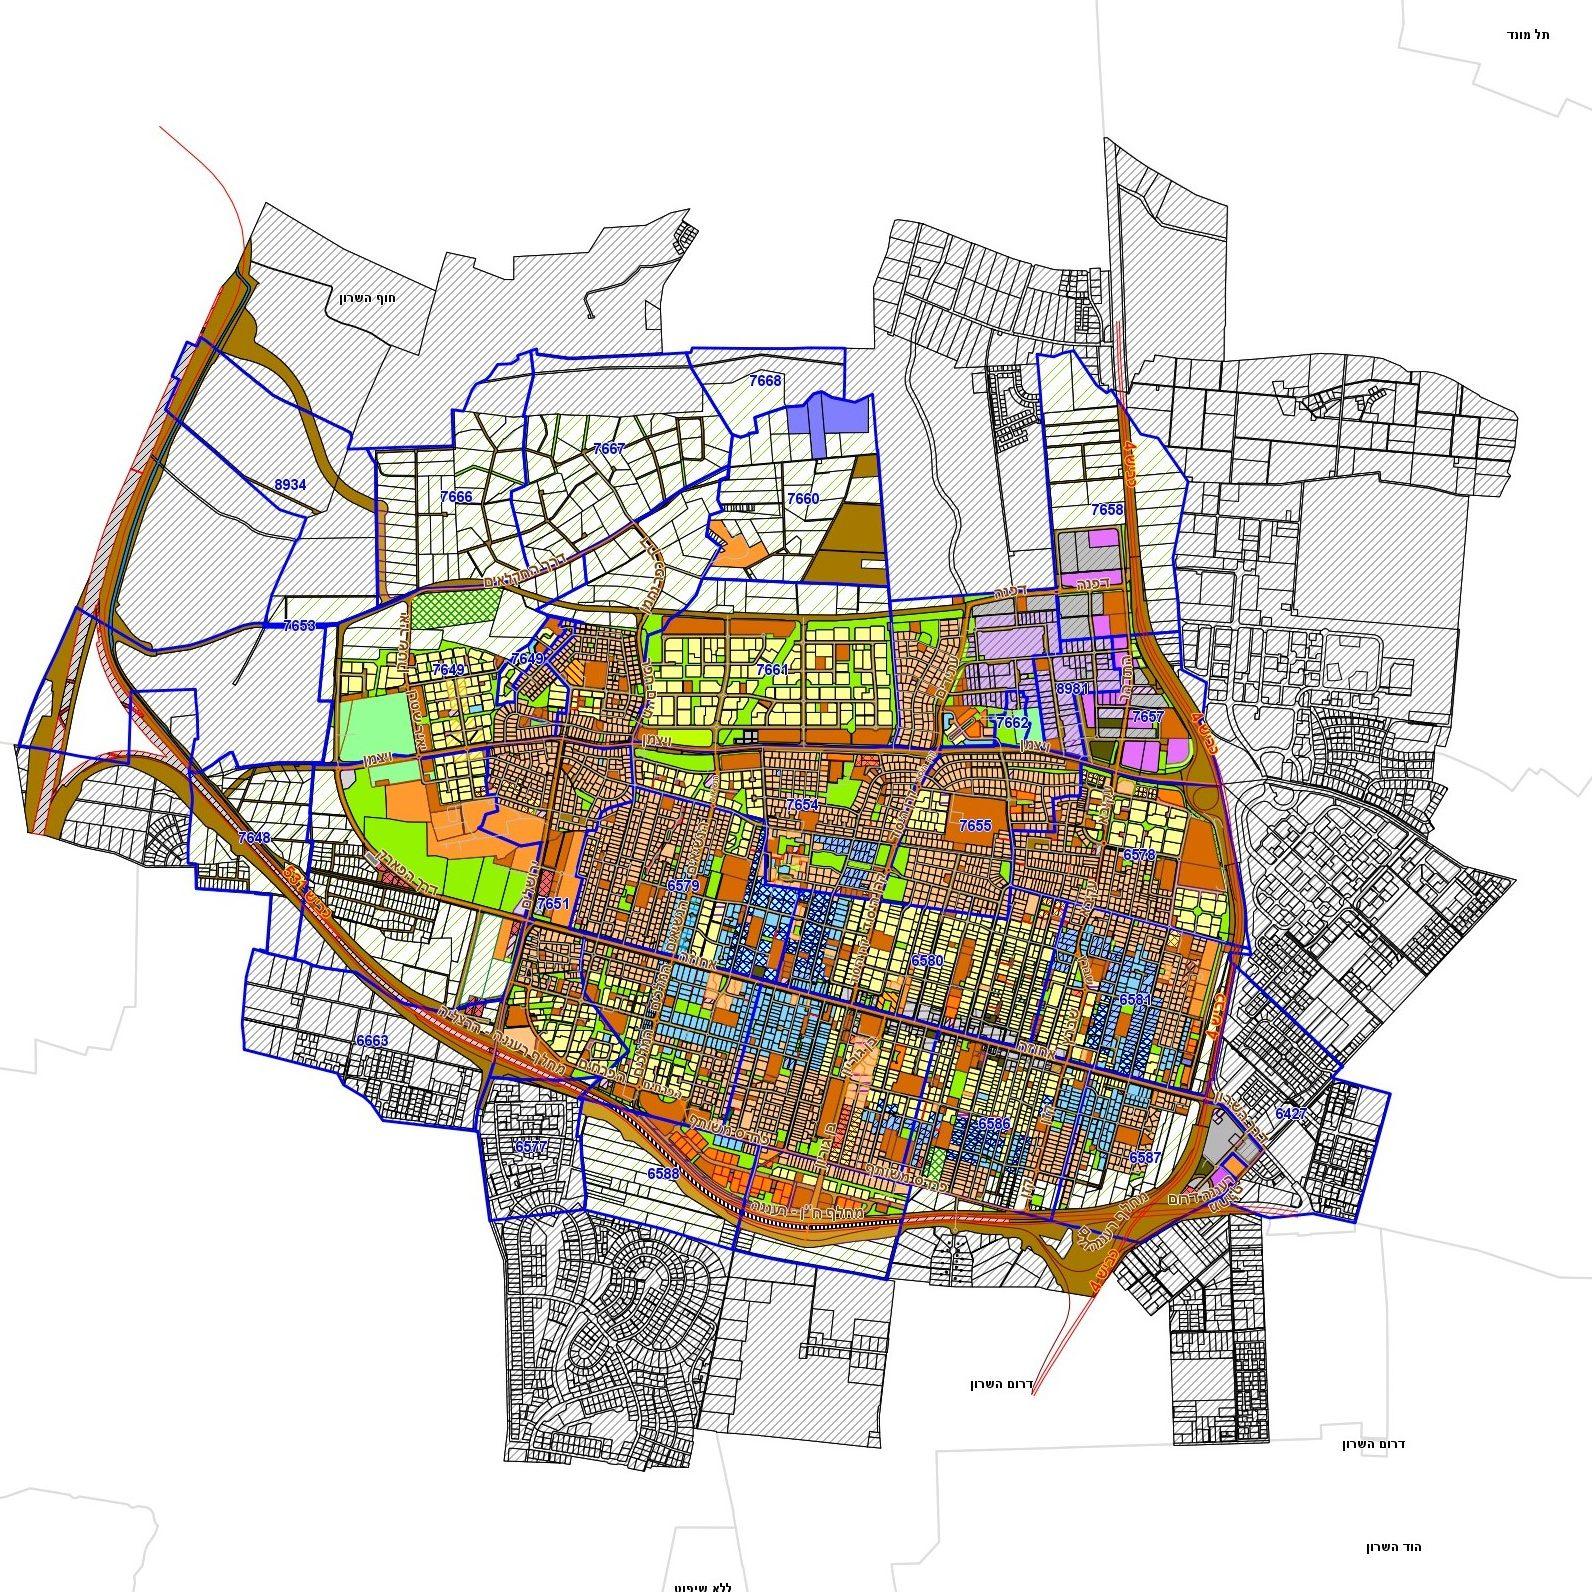 council permits pic